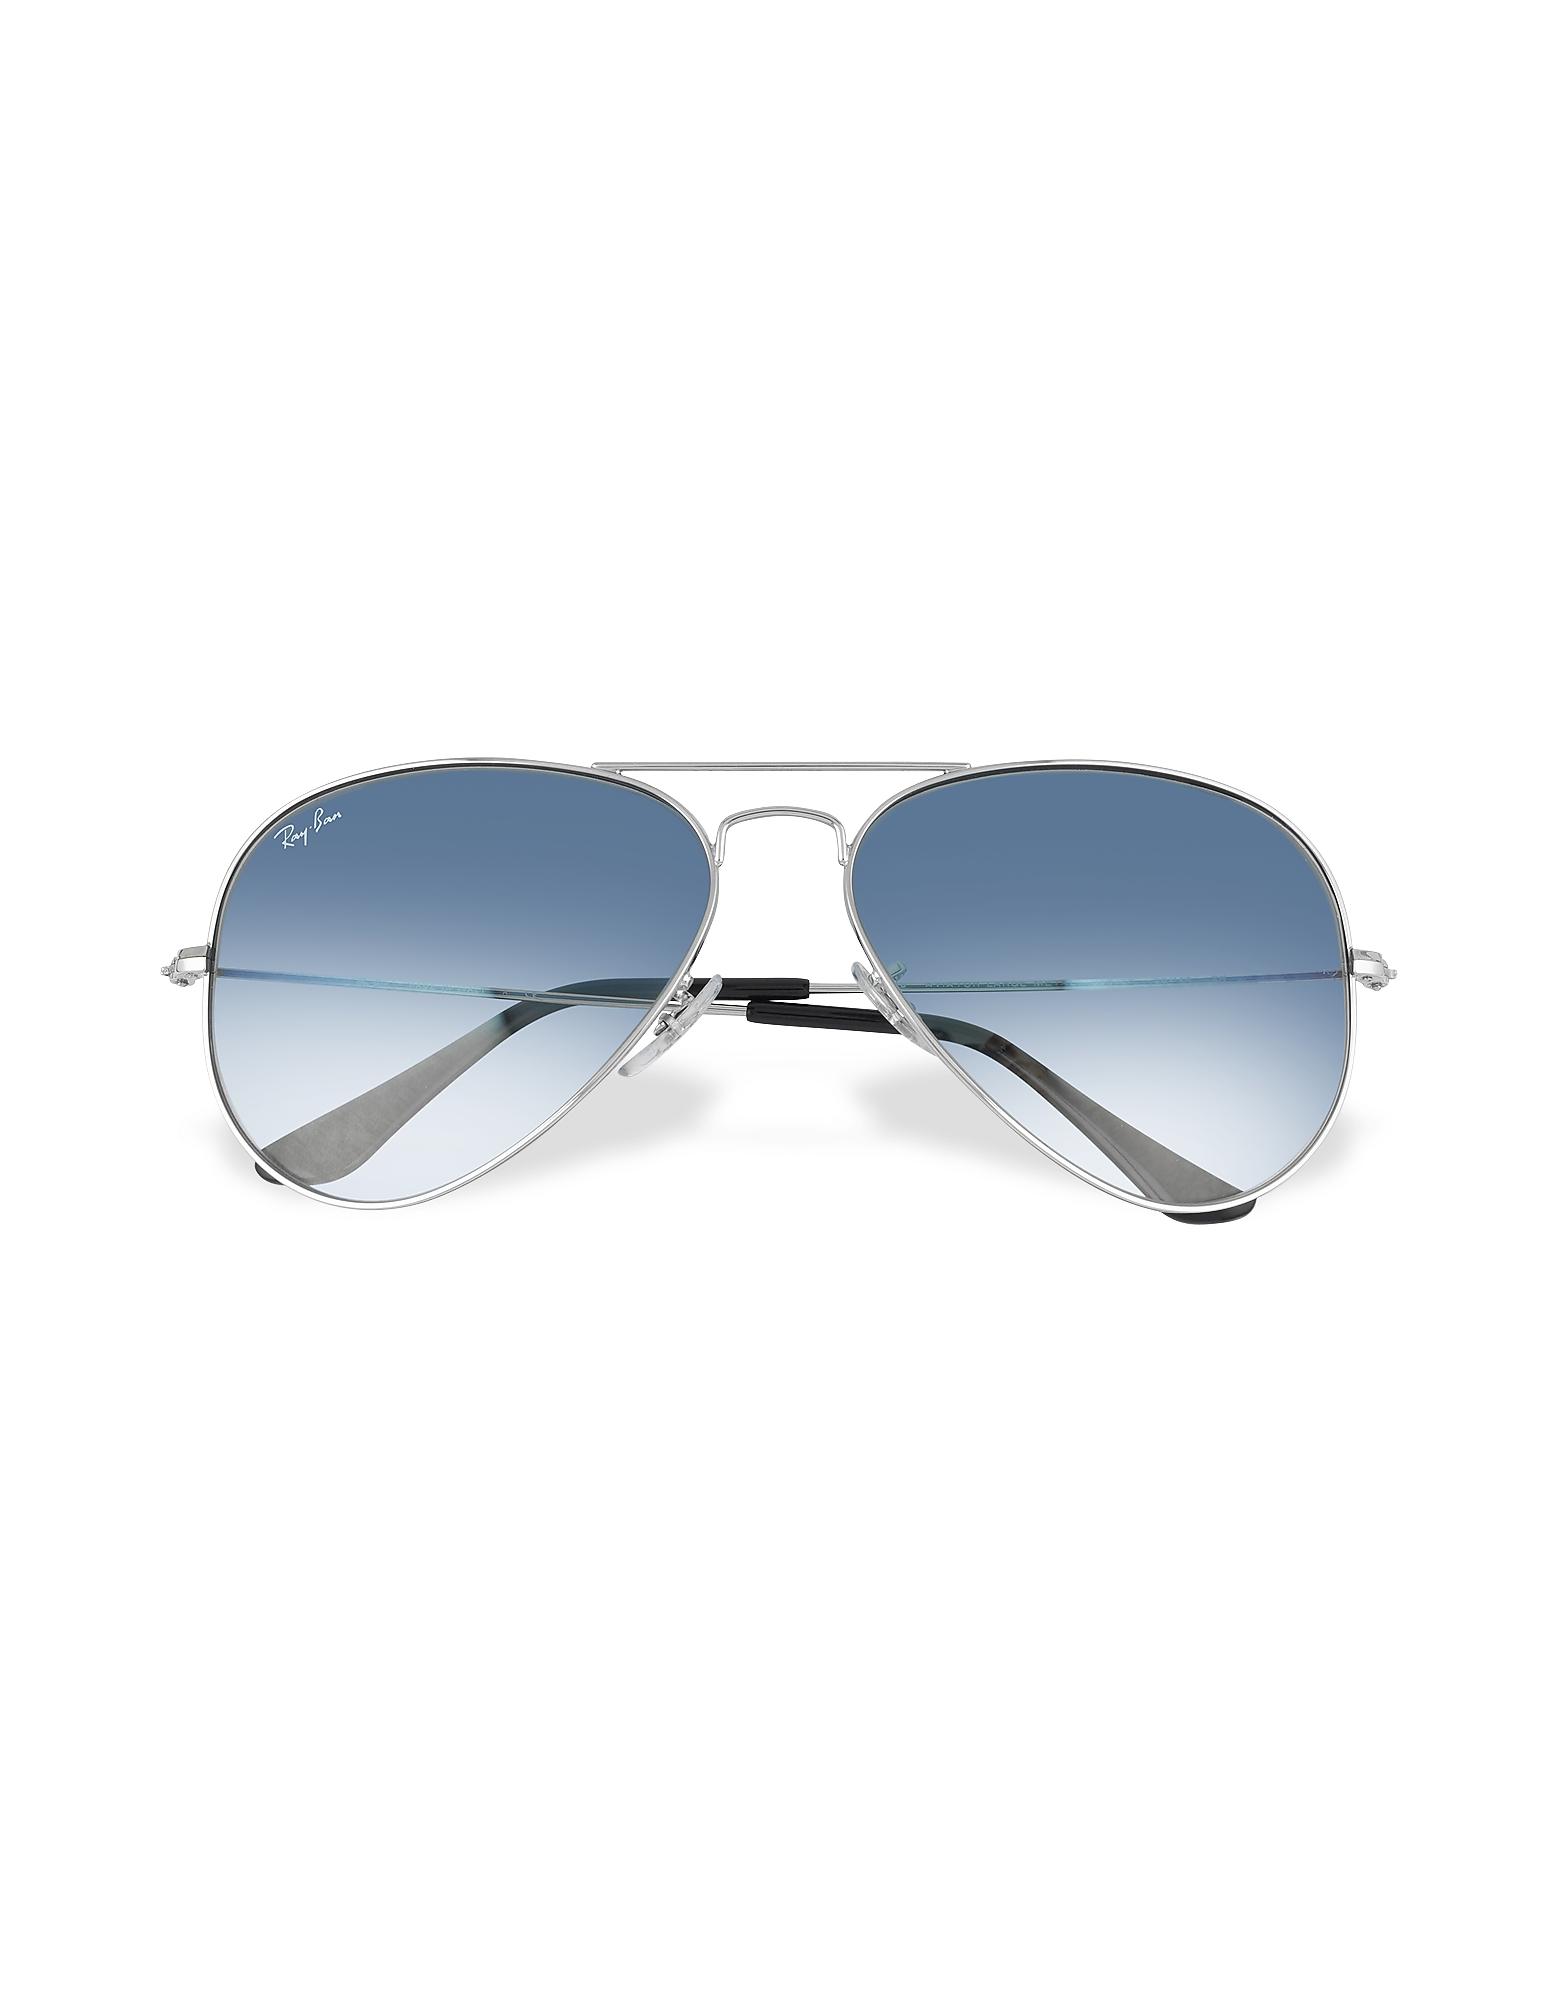 Ray Ban Sunglasses, Aviator - Silvertone Metal Sunglasses